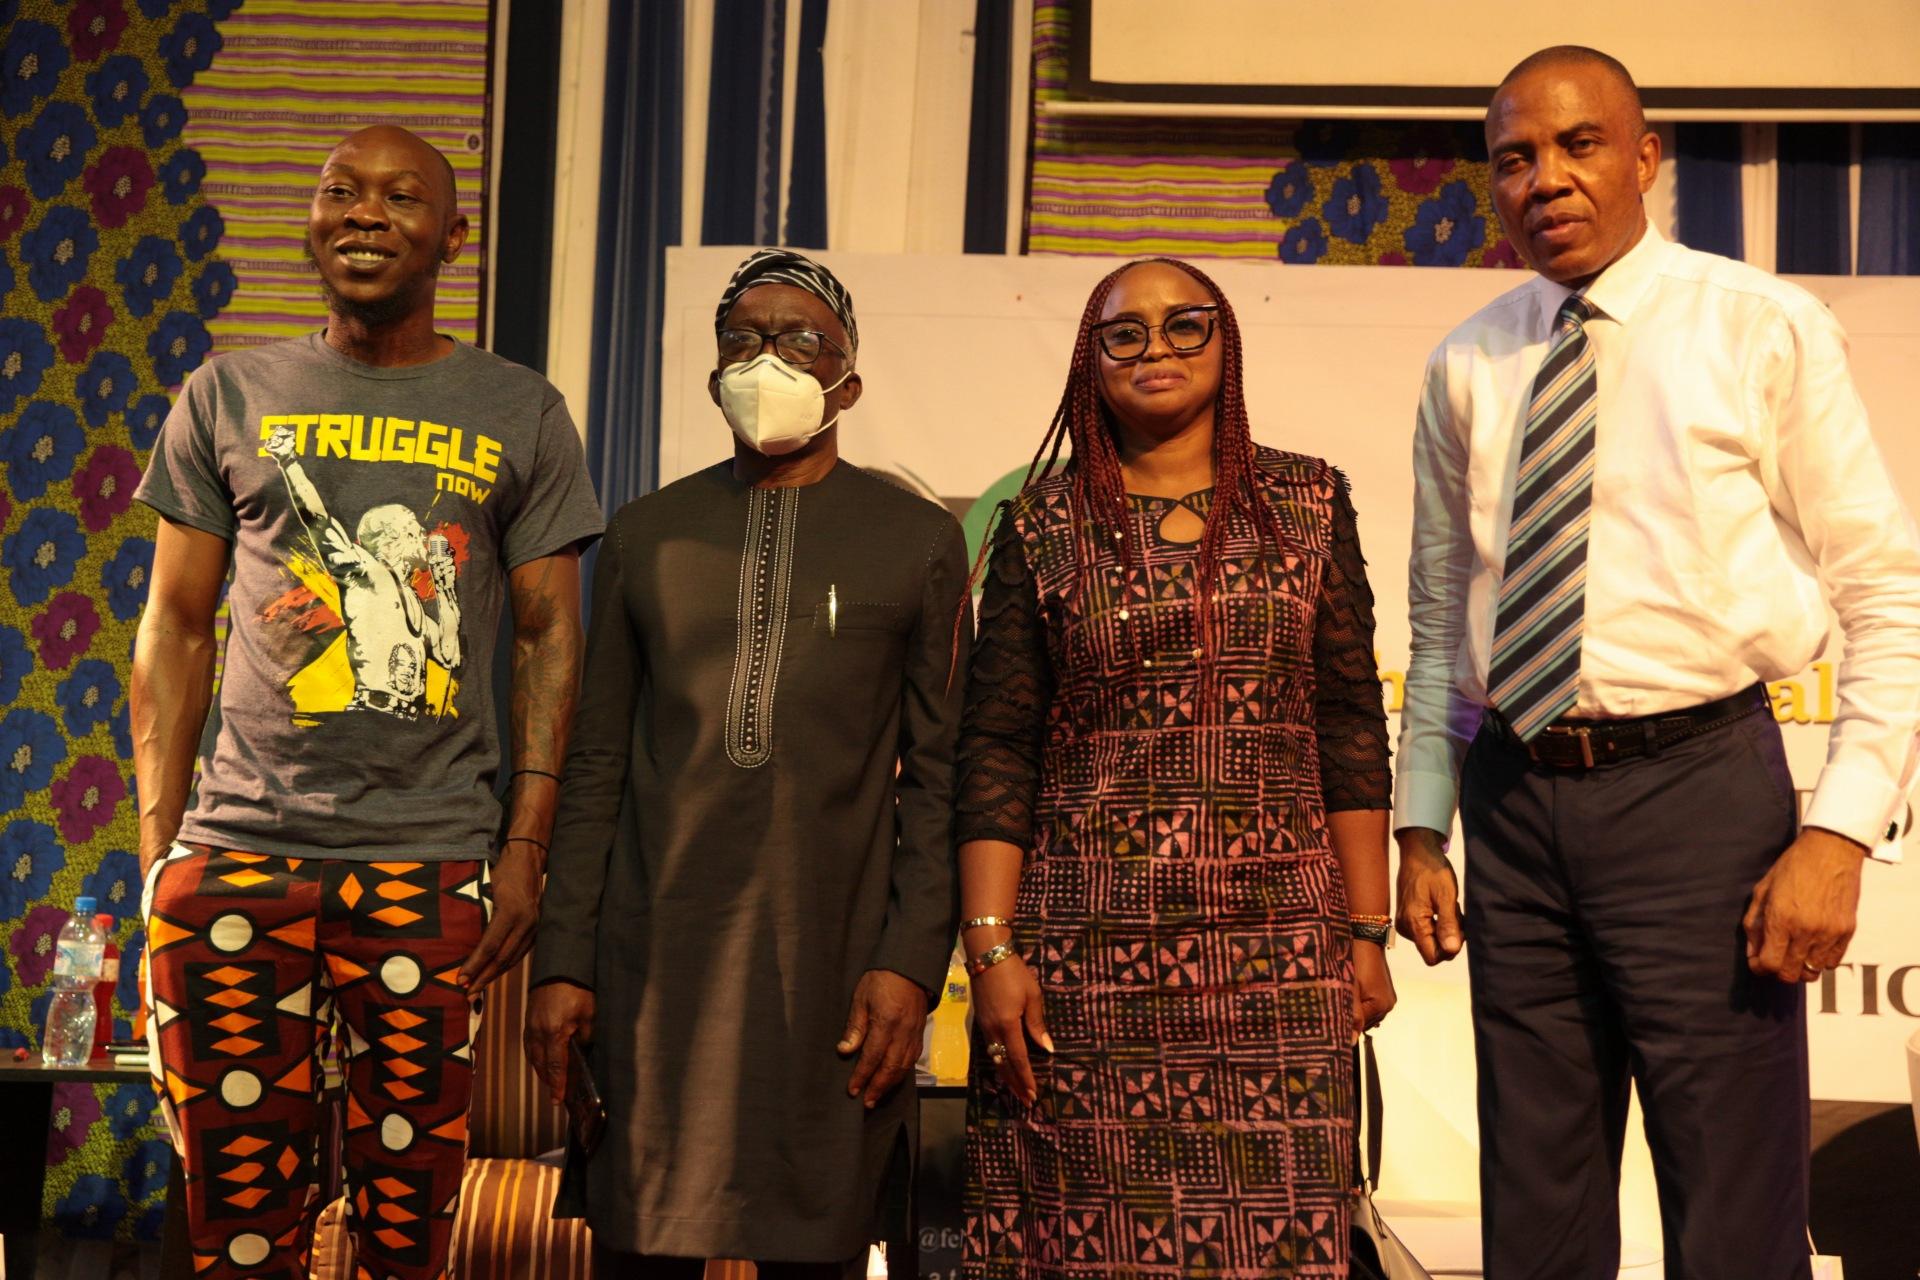 A group photograph of the panlists: L-R The moderator of the debate, Mr Femi Falana SAN and other panelists: Seun Anikulapo Kuti, Arinola Oloko and Mr Tony Nnadi